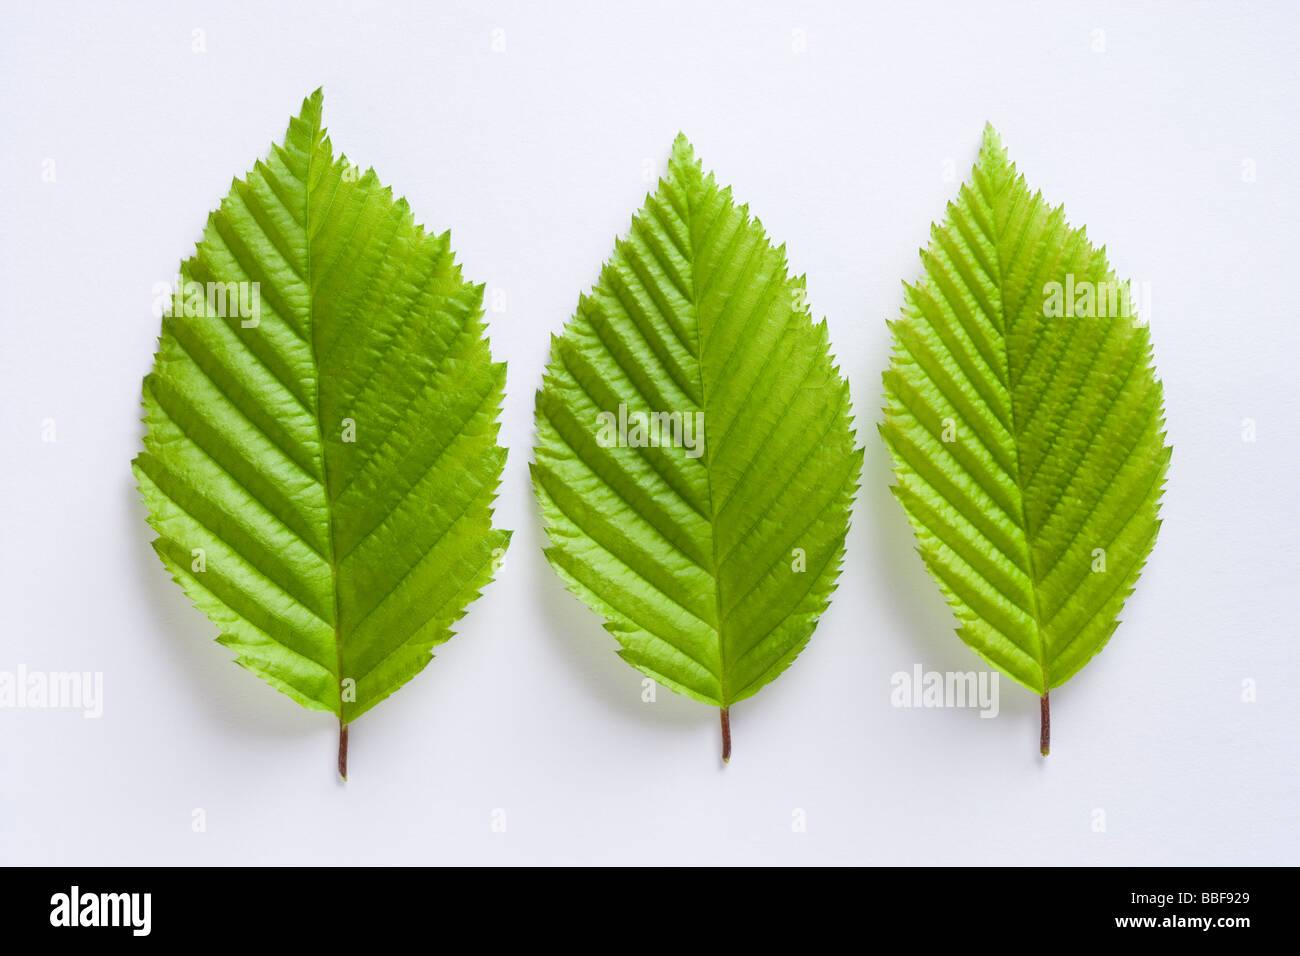 Leaves from hornbeam tree, Carpinus betulus. - Stock Image